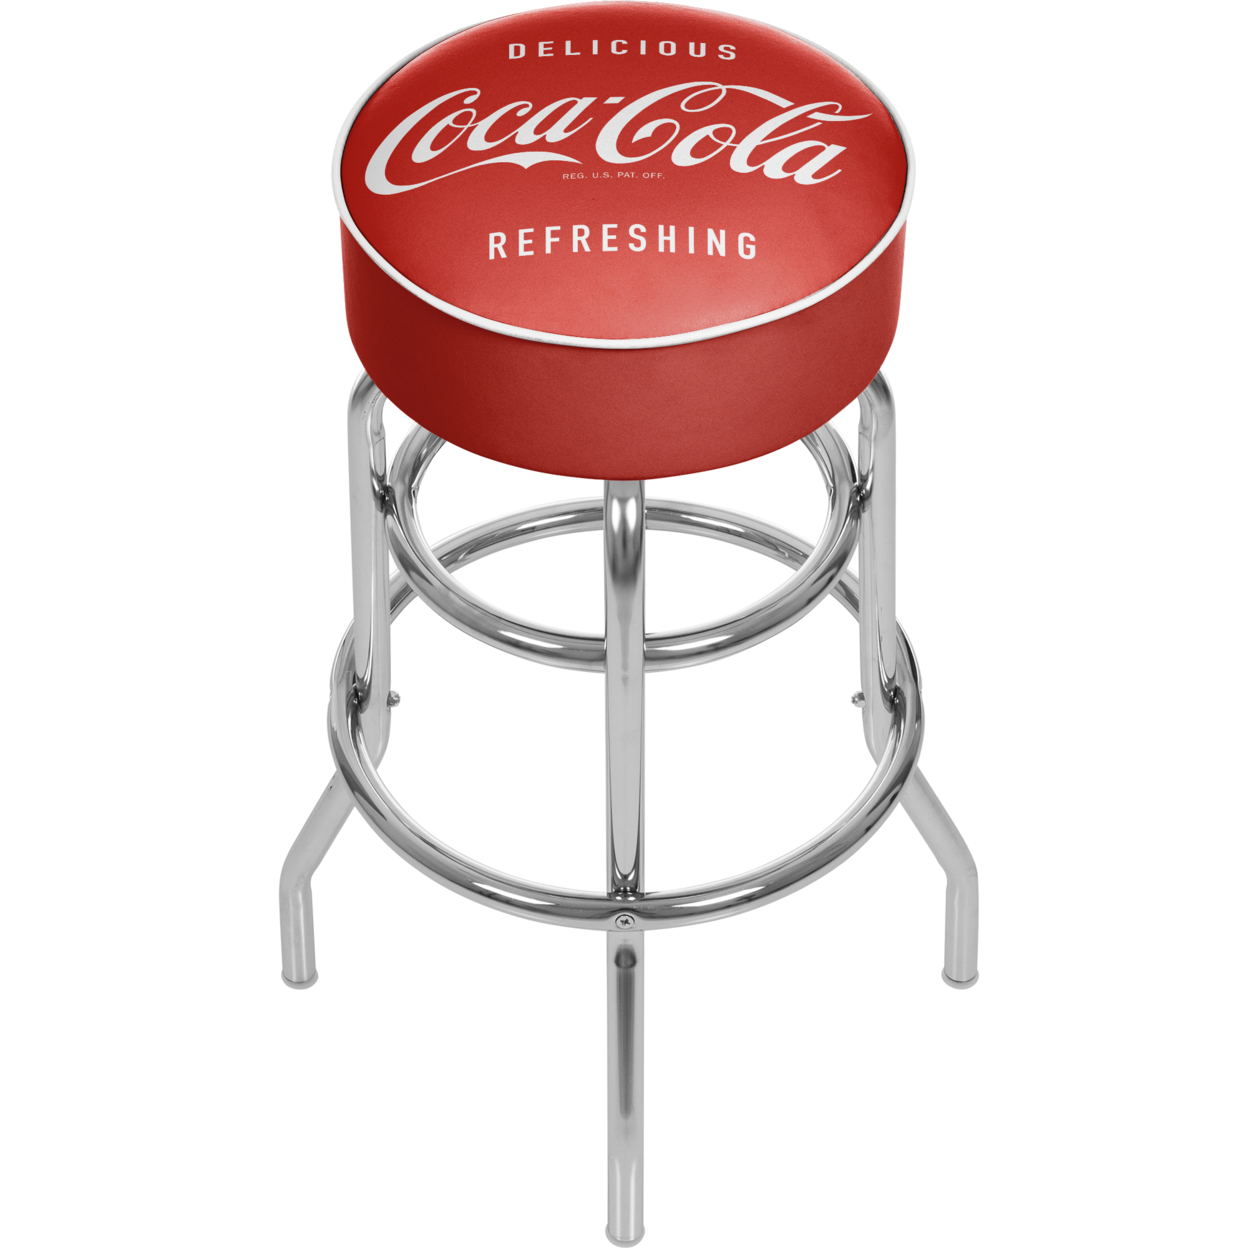 Coca Cola Vintage Padded Swivel Bar Stool 30 Inches High coca cola vanilla нижний новгород